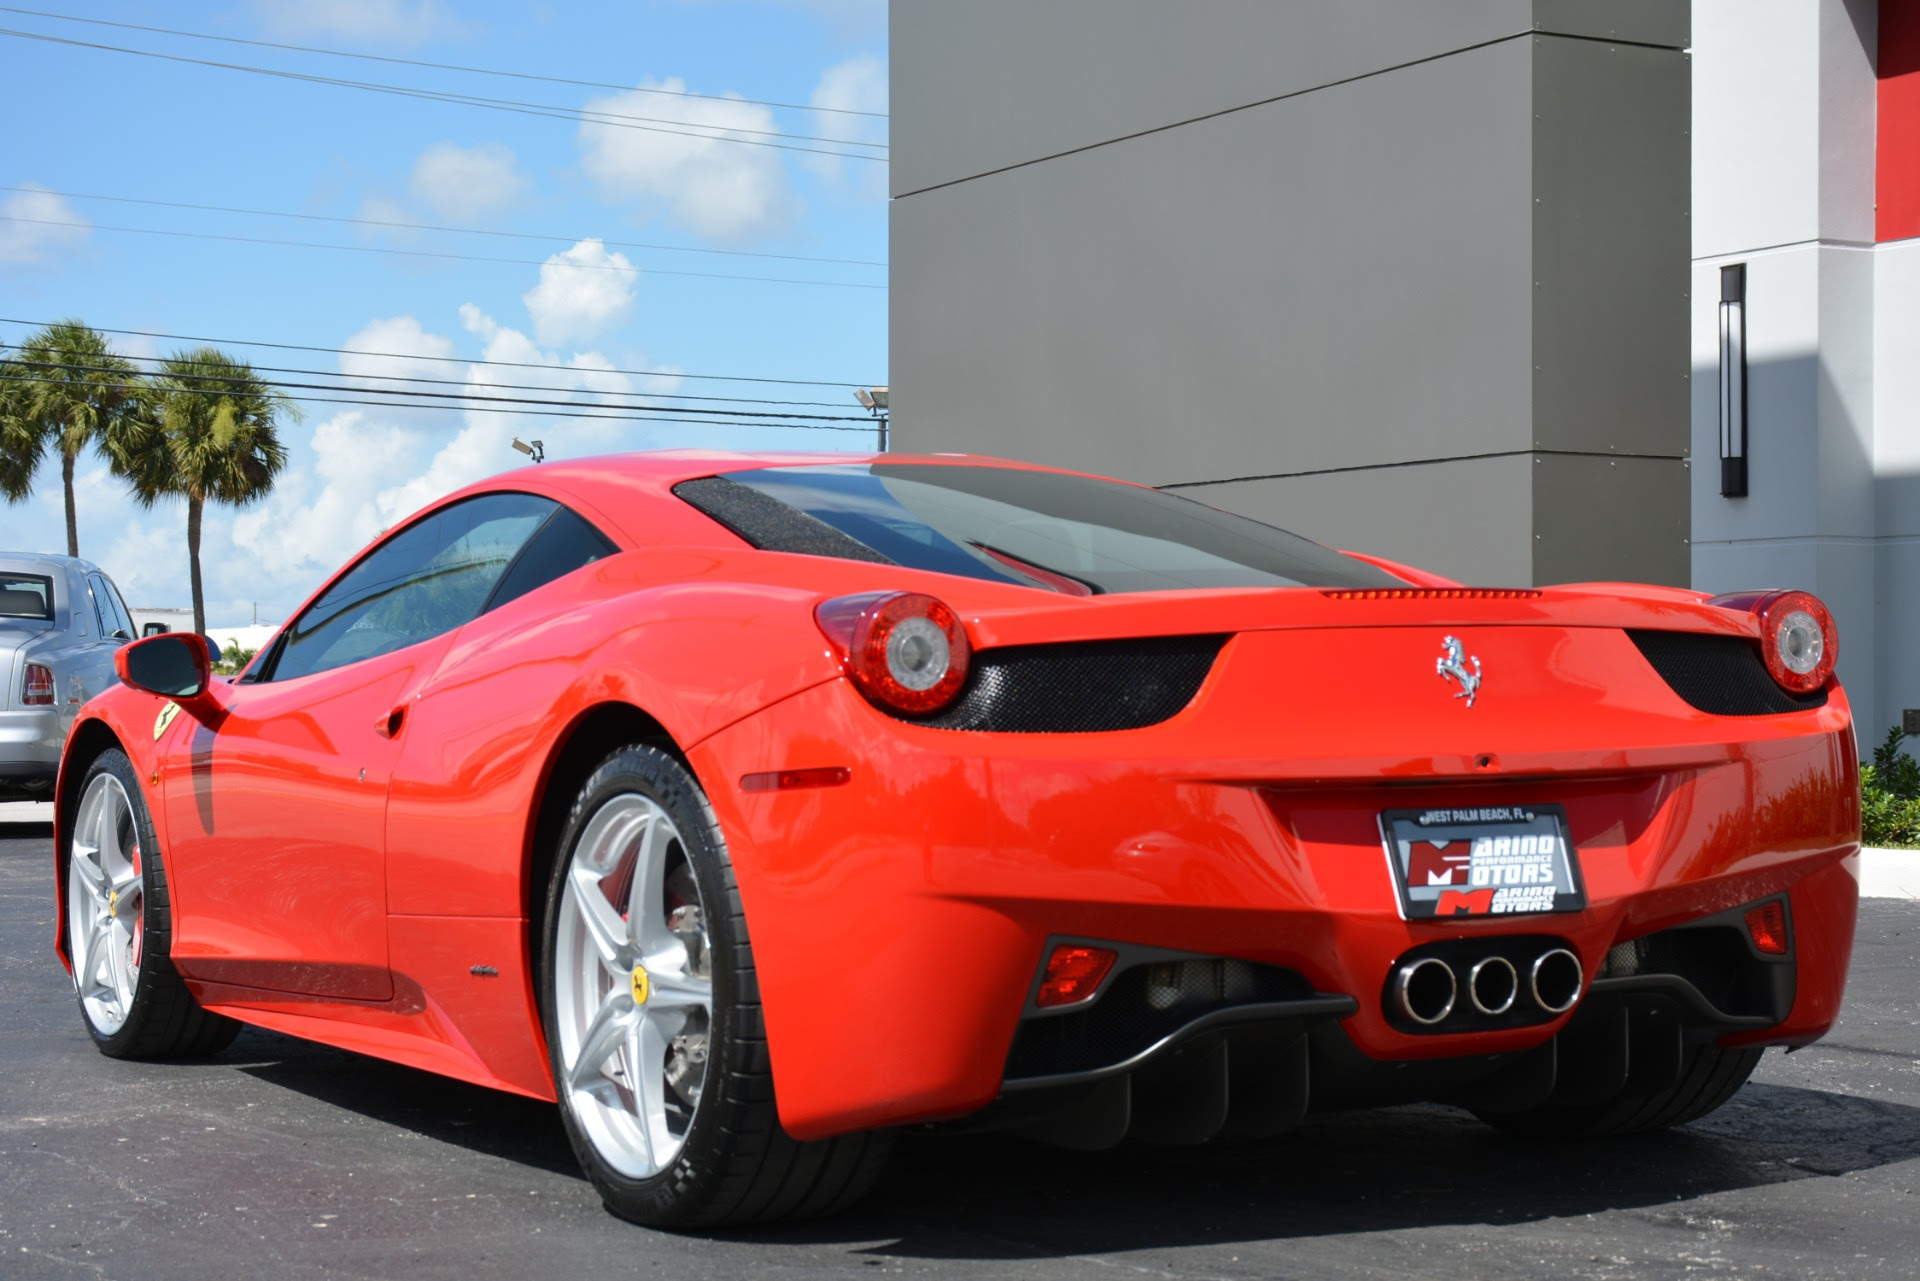 Used 2011 Ferrari 458 Italia For Sale ($182,900)   Marino Performance Motors Stock #182436